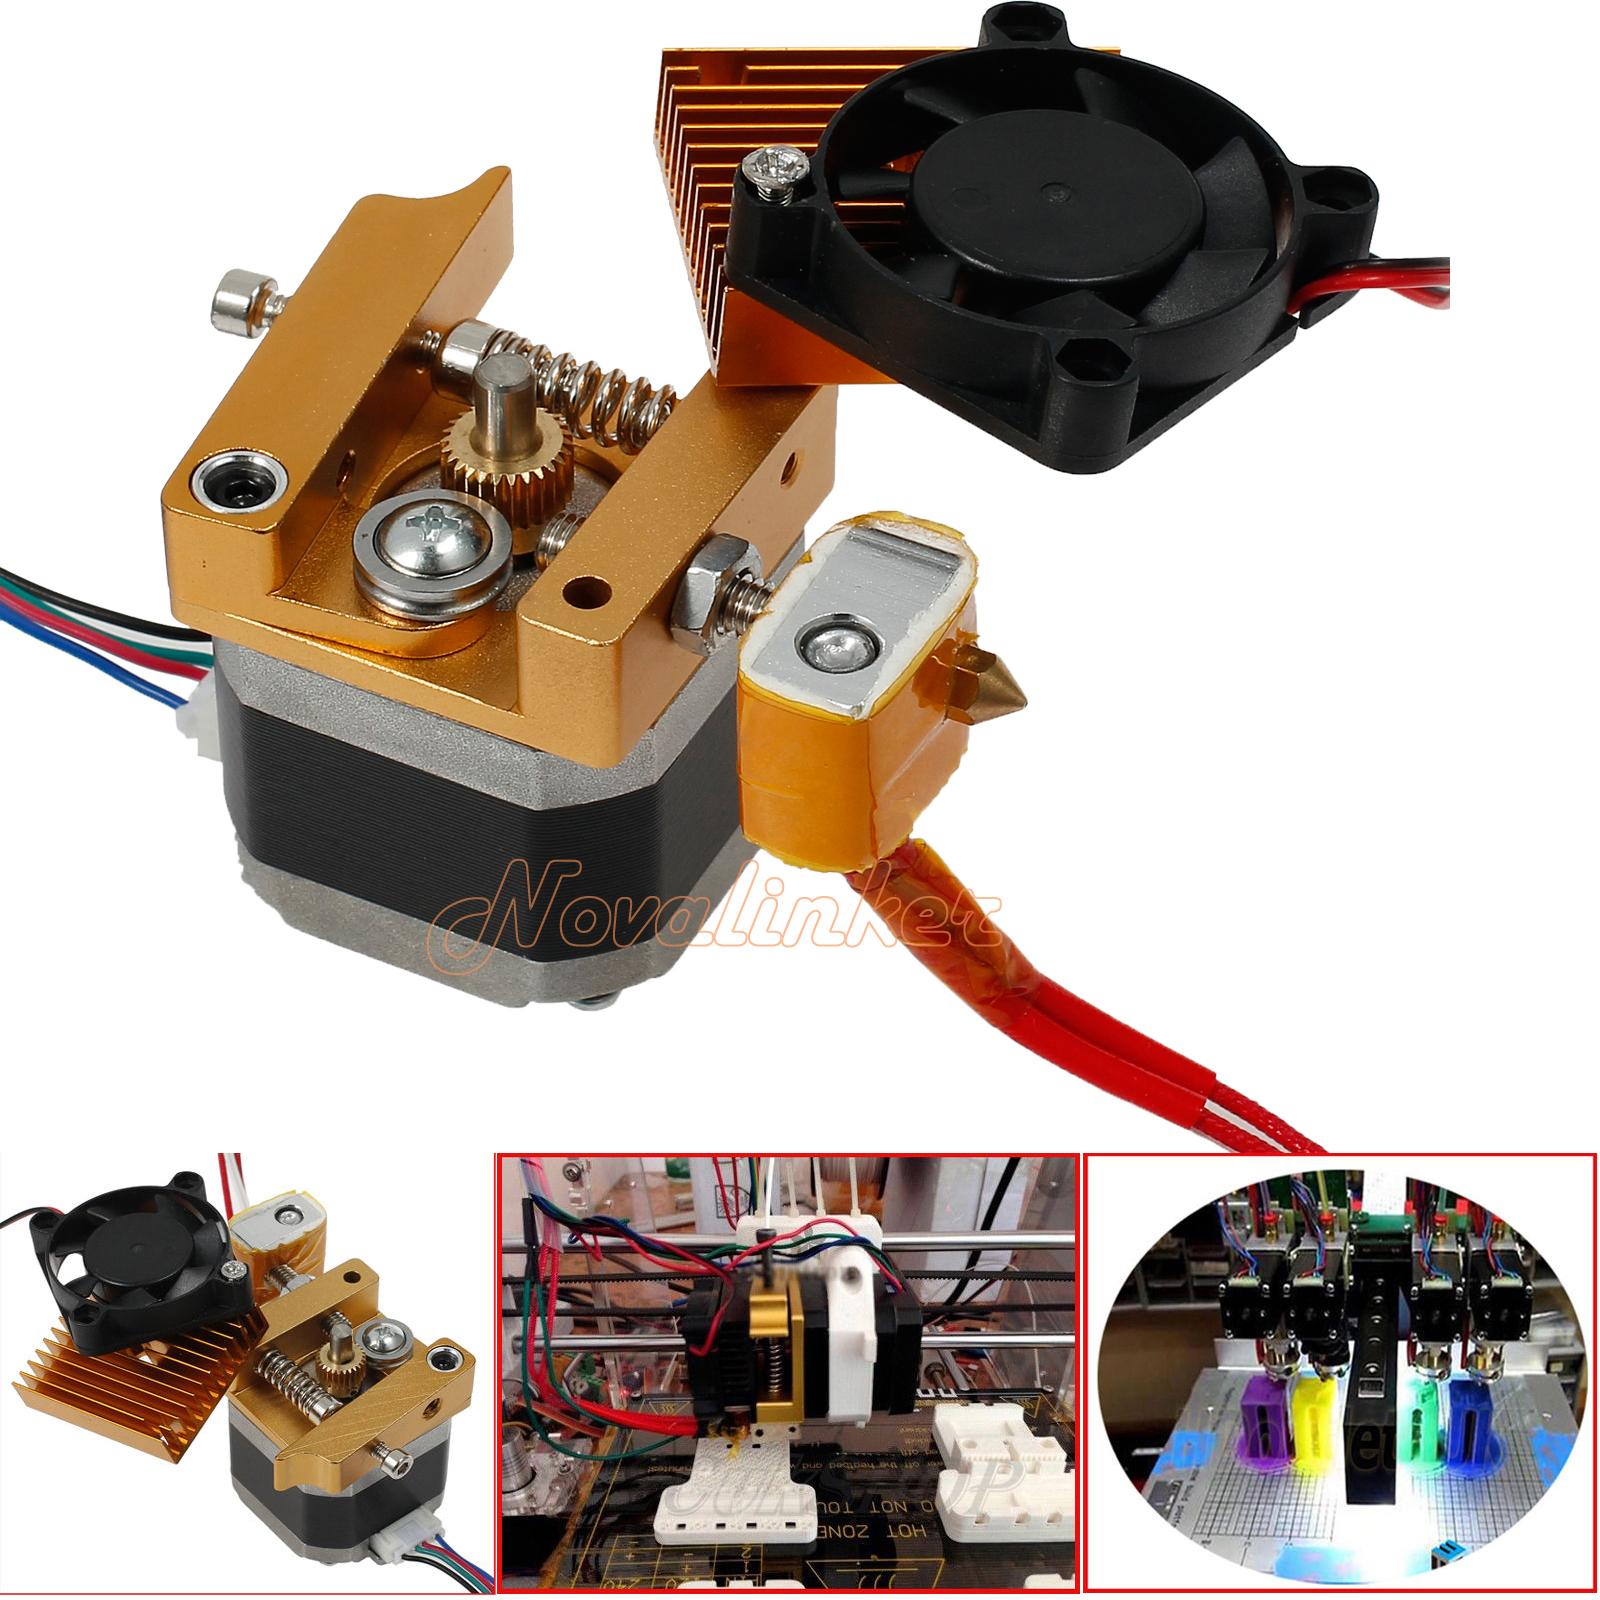 Nozzle Latest Upgrade 3D Printer MK8 Extruder Sensor hotend 0.4mm Print Head